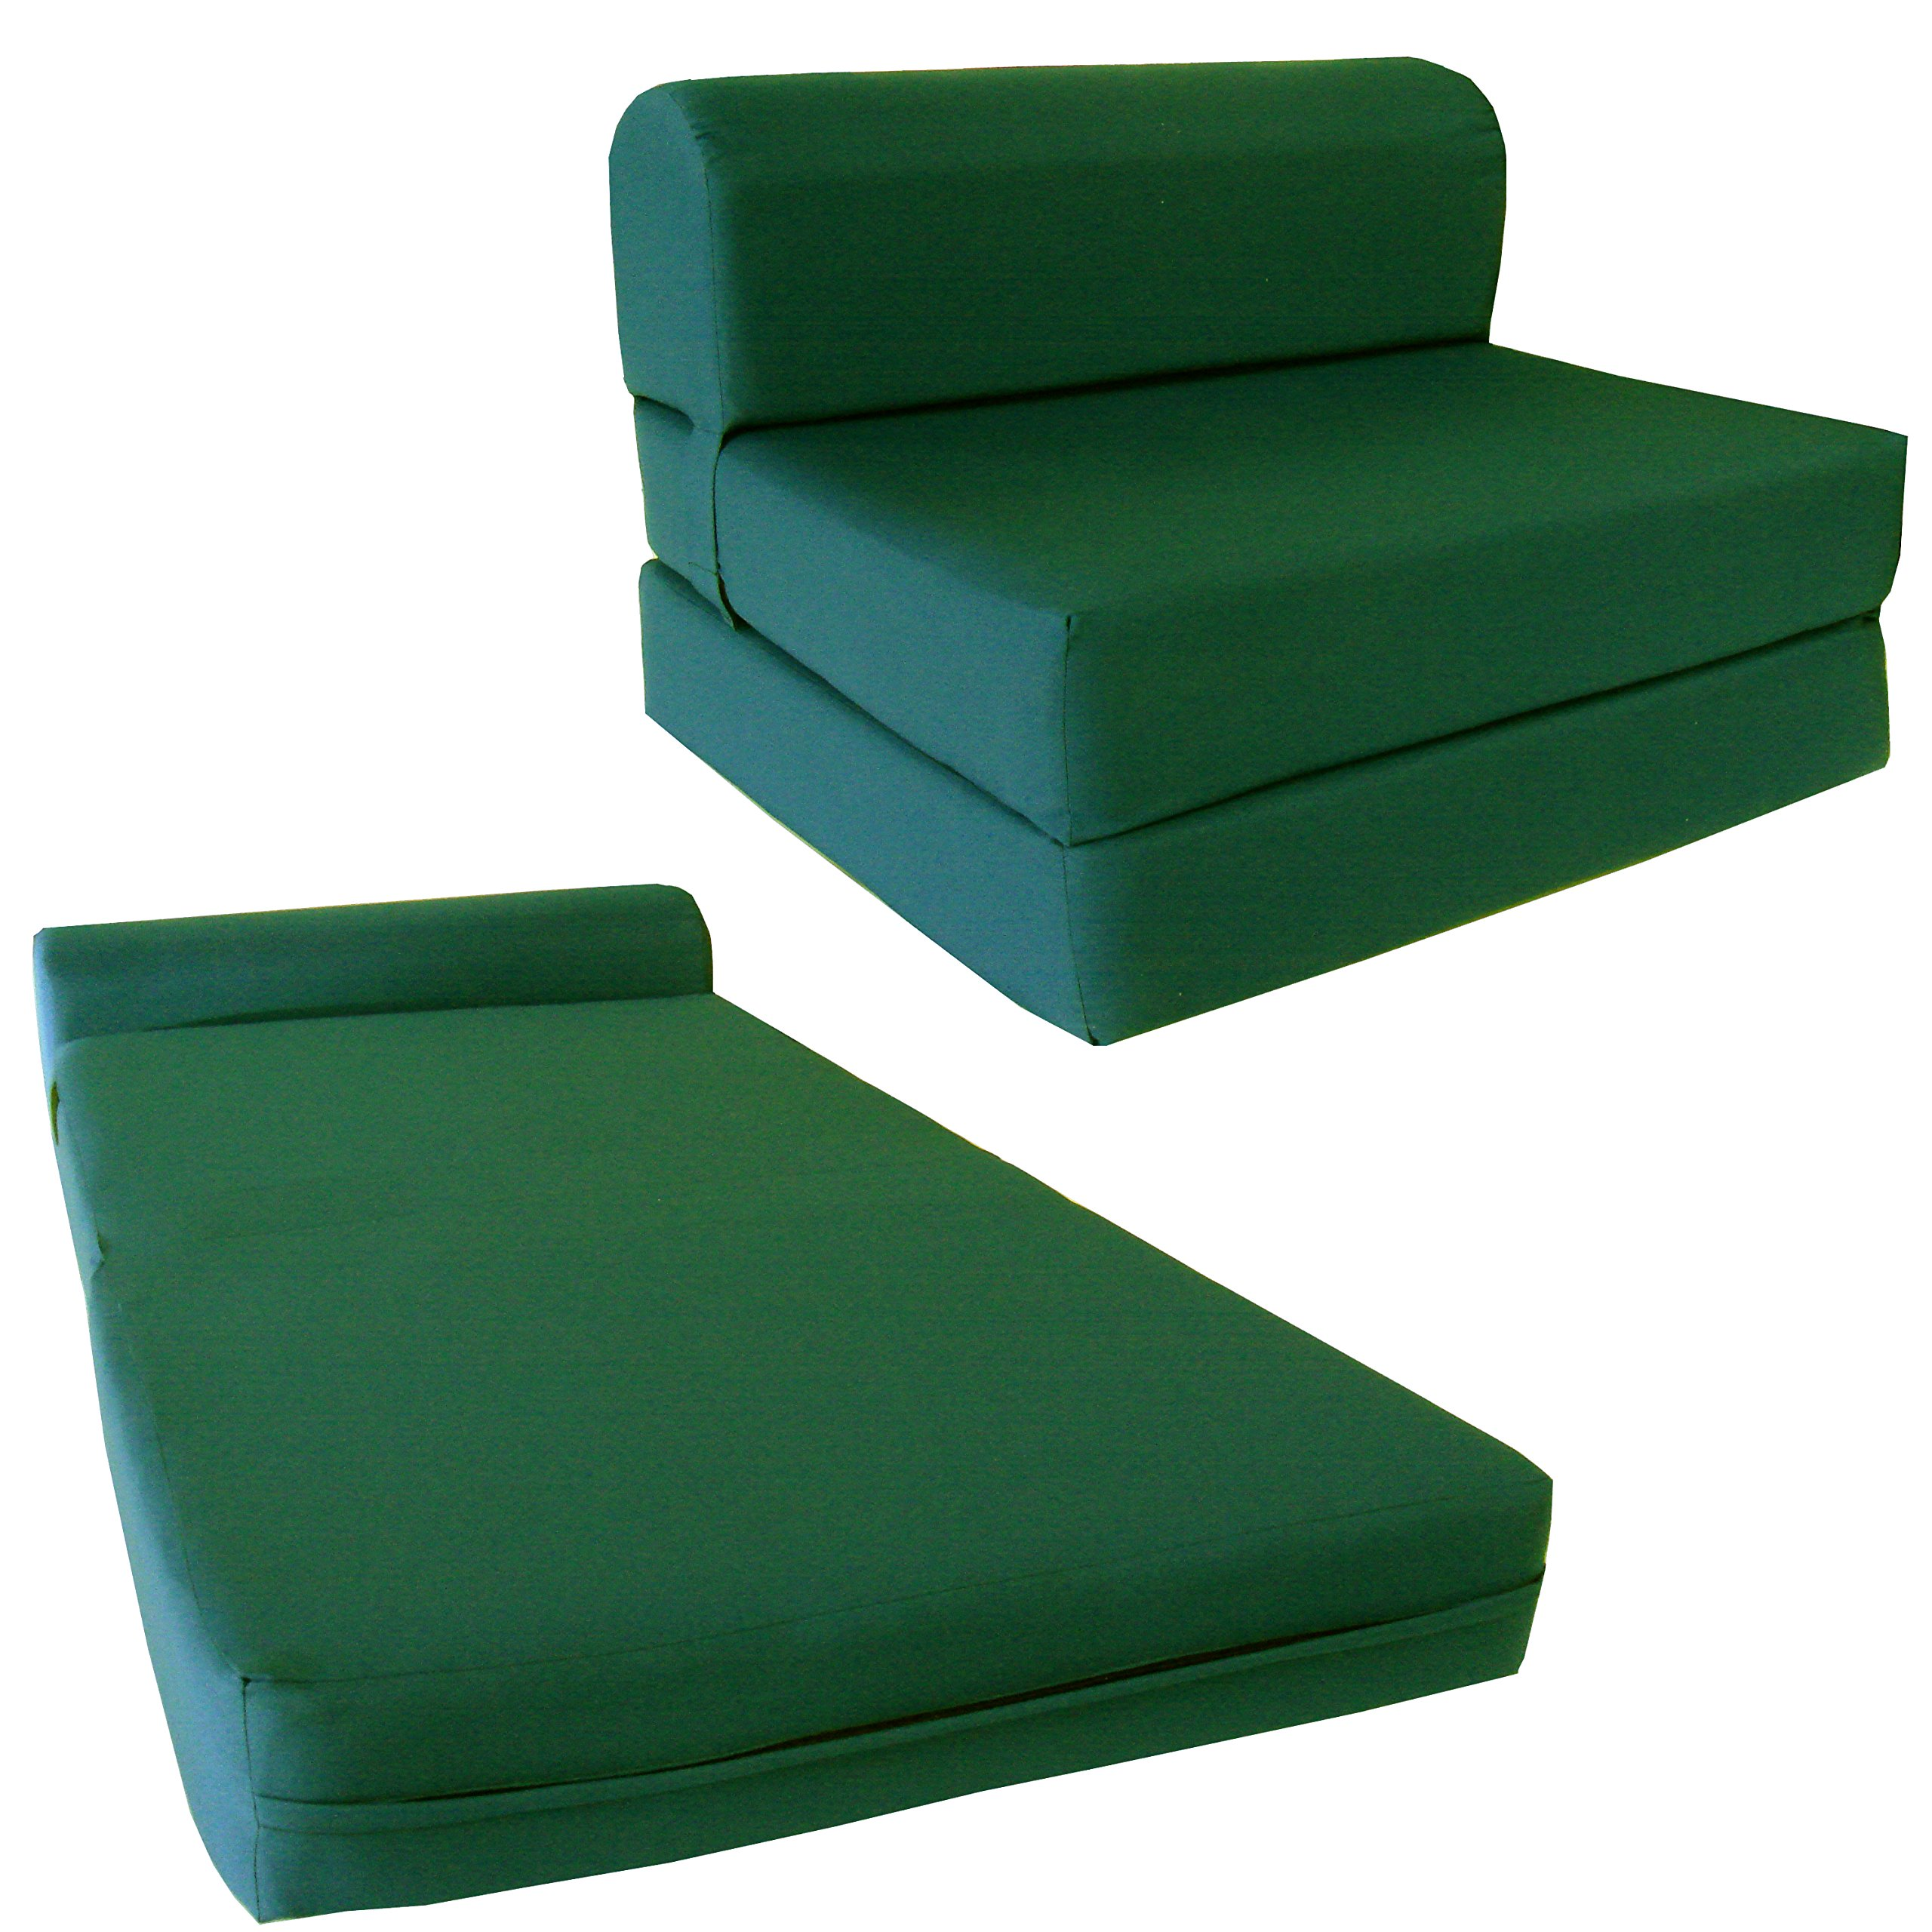 Chair Folding Foam Bed, Studio Sofa Guest Folded Foam Mattress (6'' x 32'' x 70'', Hunter Green) by D&D Futon Furniture.